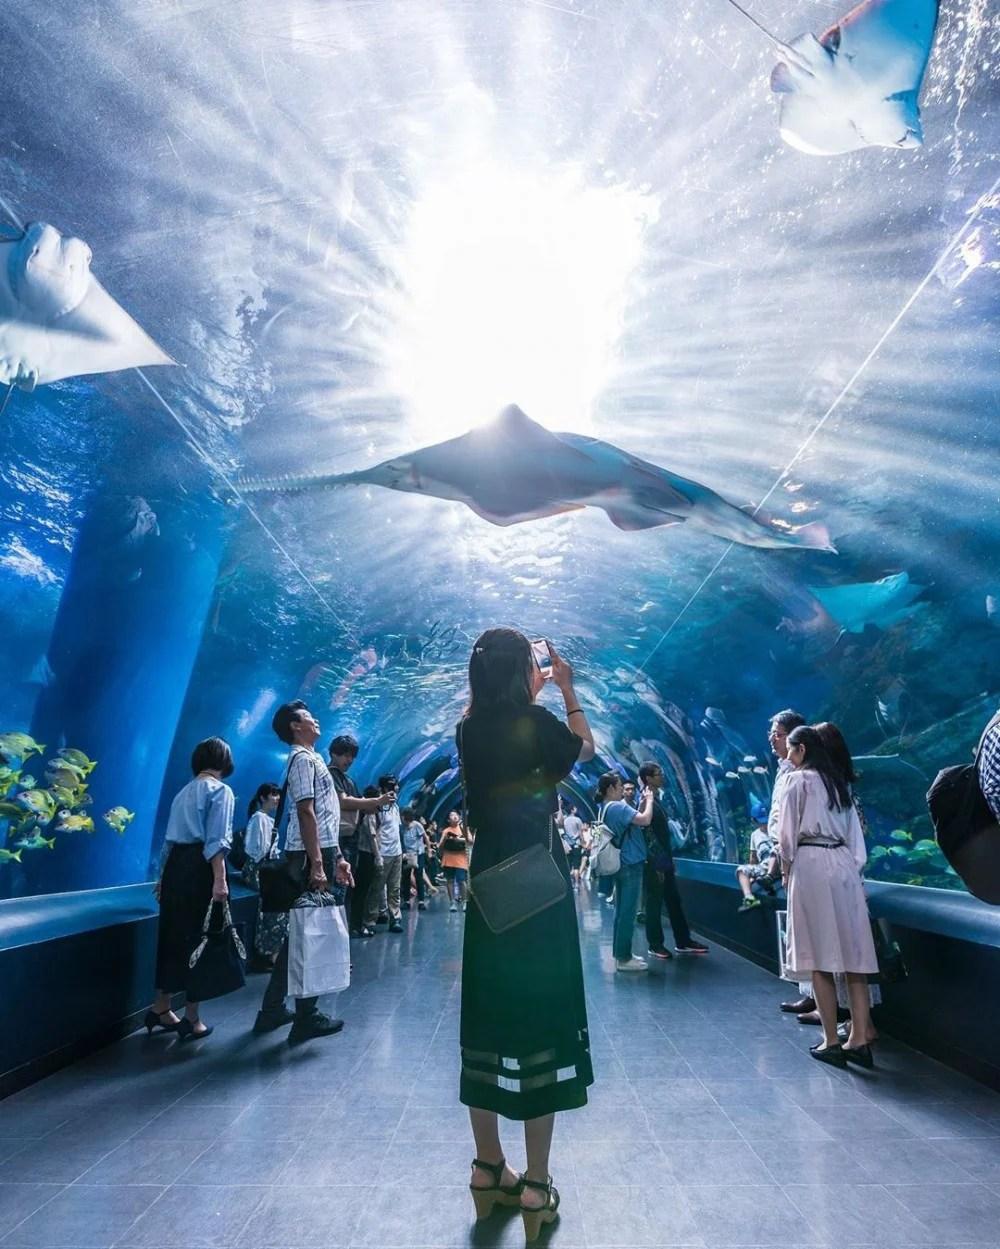 【Xpark】臺灣全新水族館門票已開放預售! | PopLady